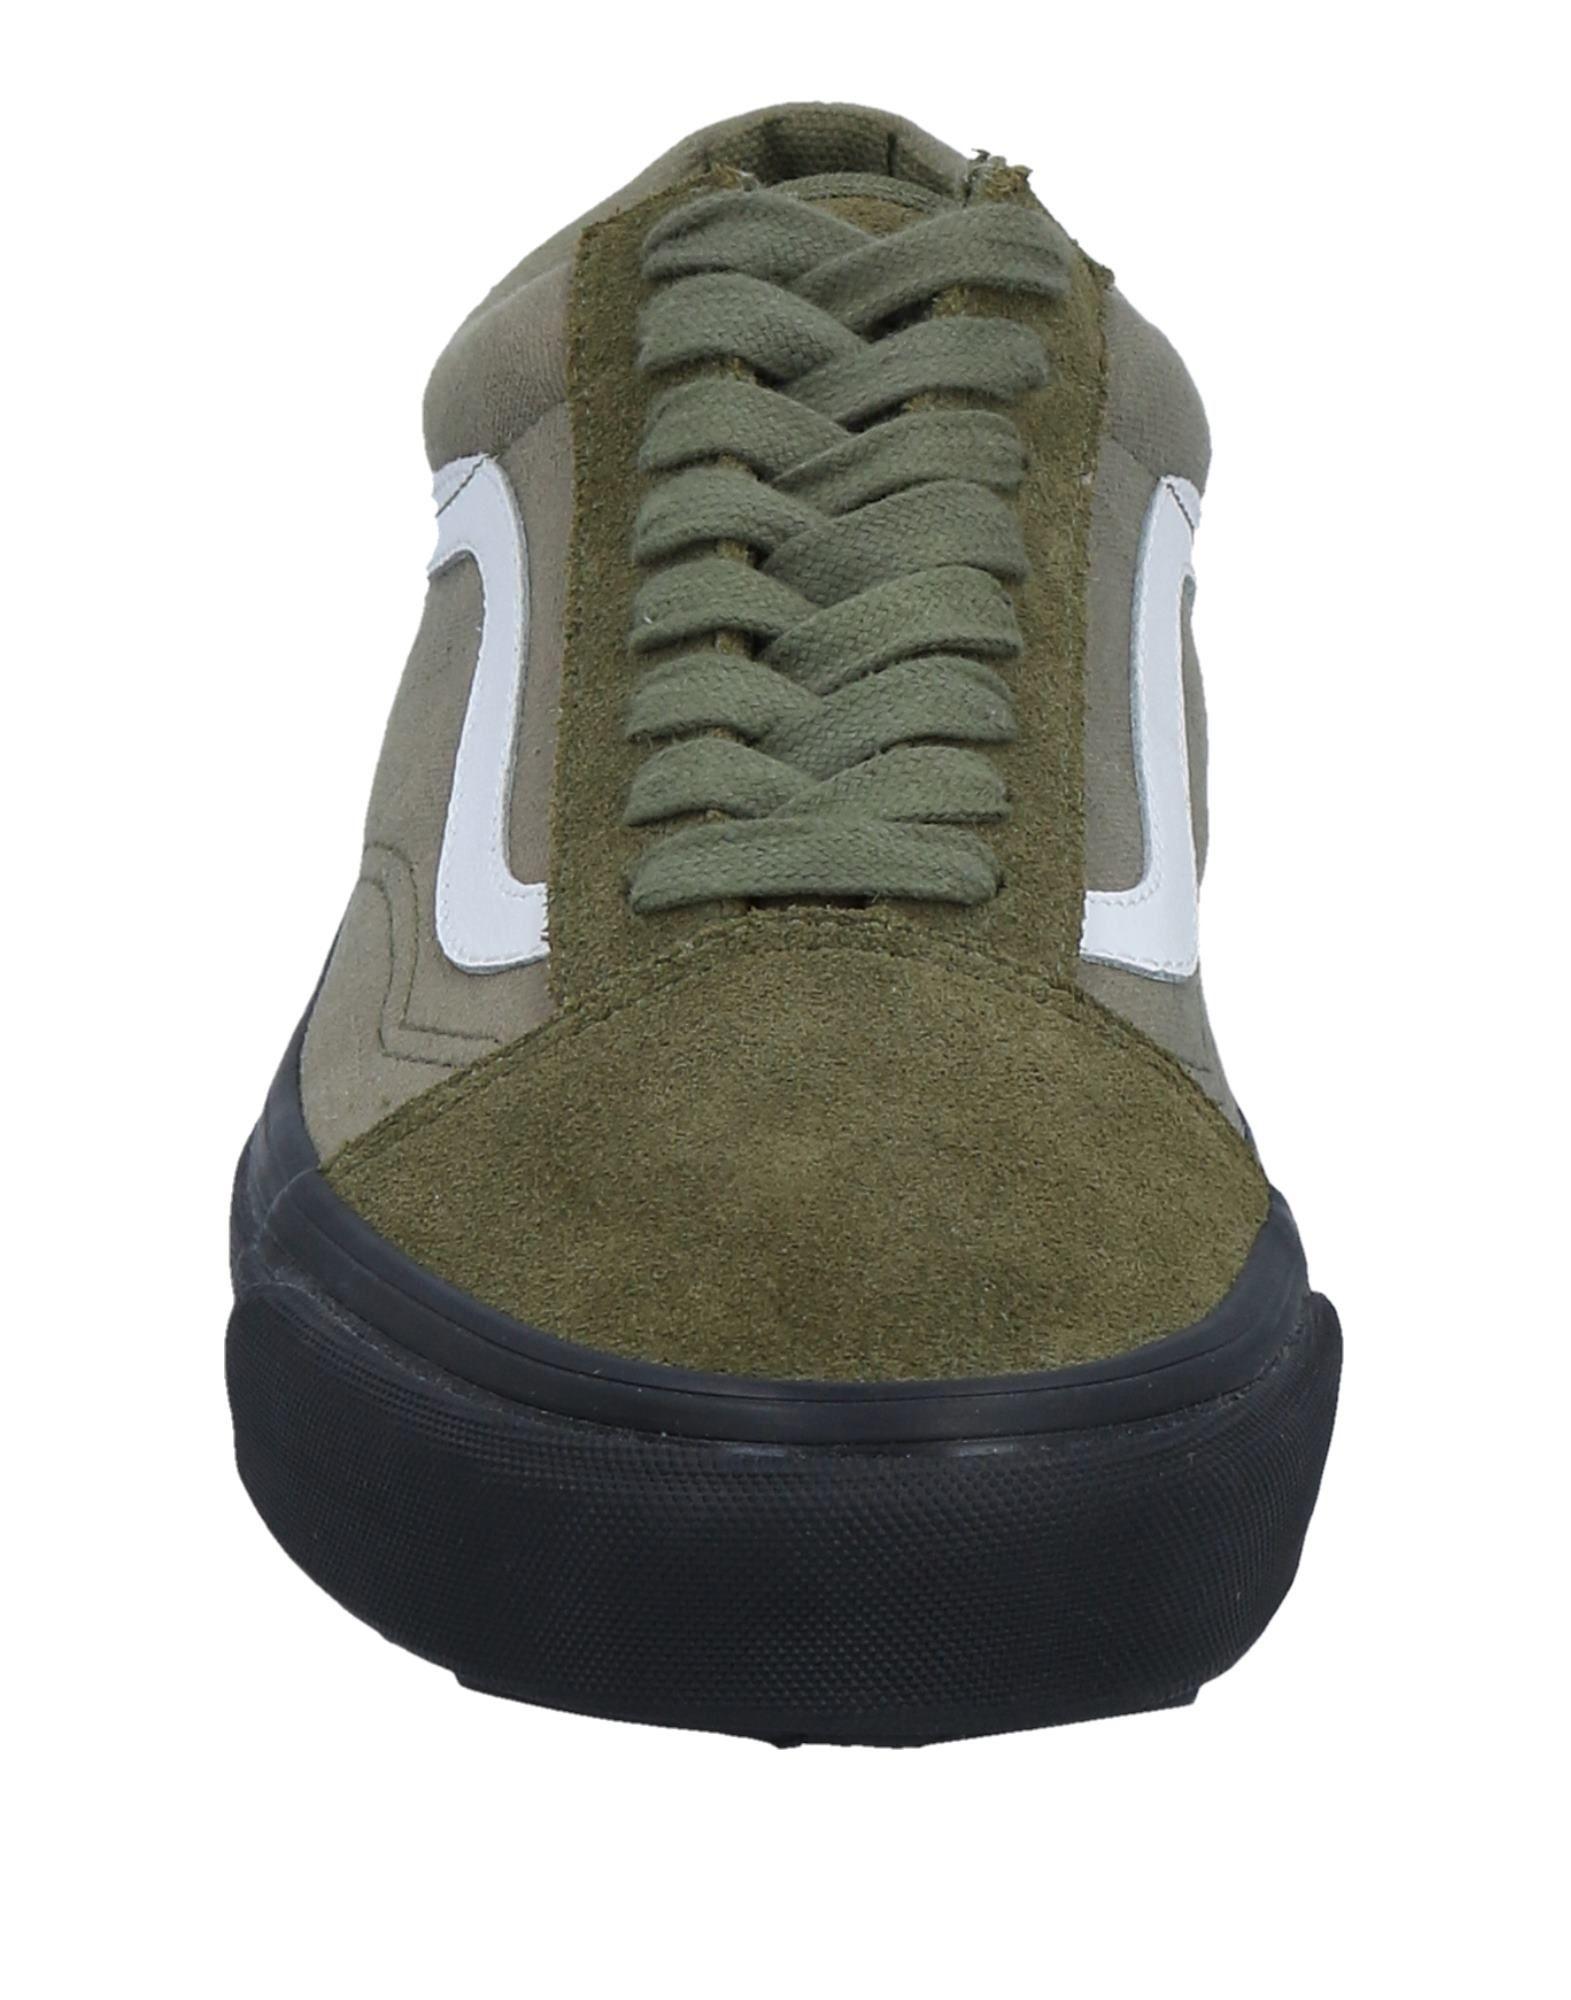 11508733JD Vans Sneakers Herren  11508733JD  ff5a5a